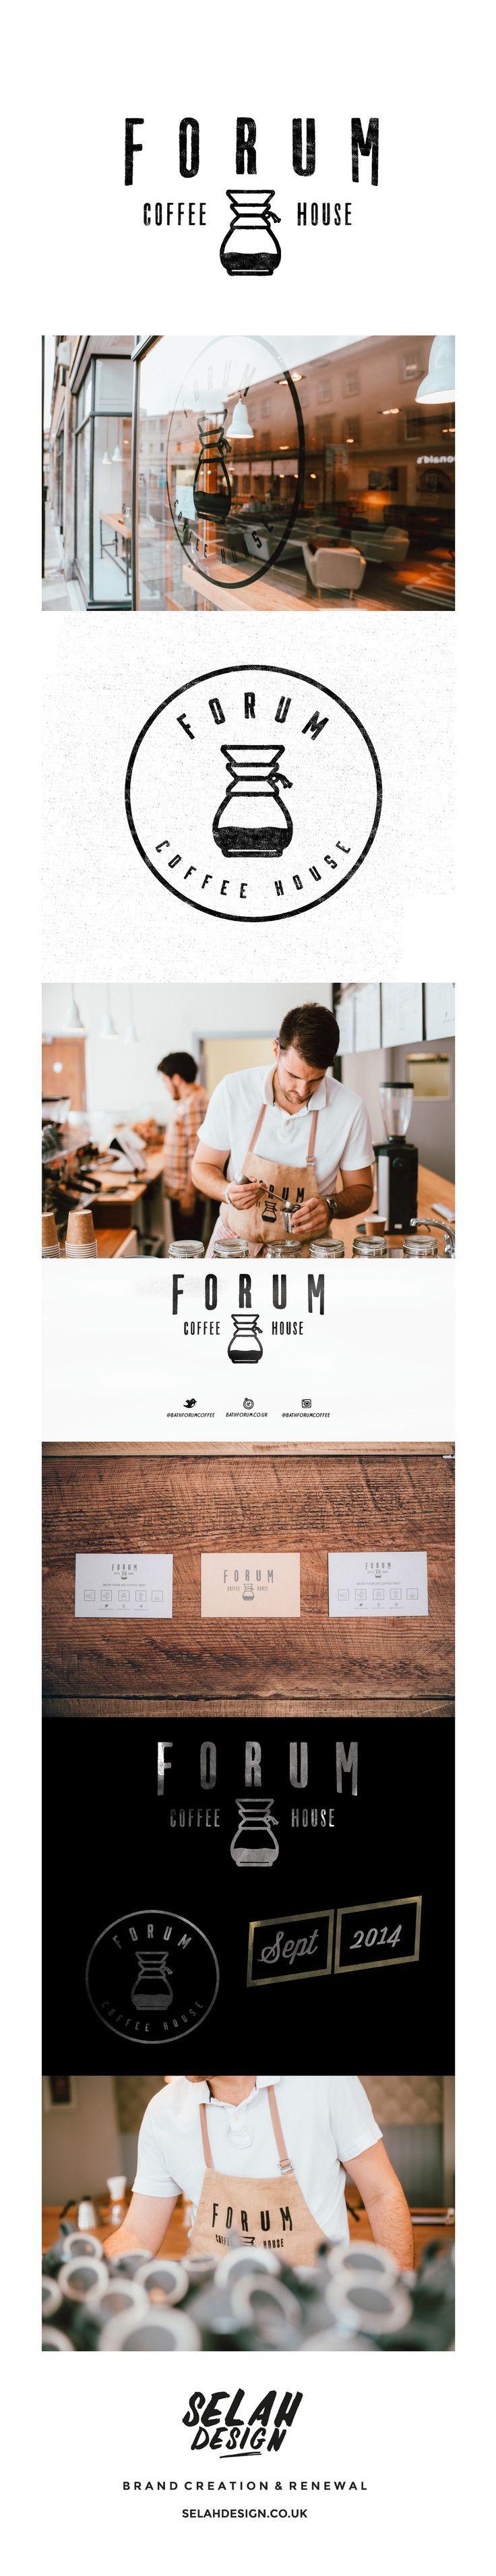 Forum Coffee House Branding Deisgn by Selah Design